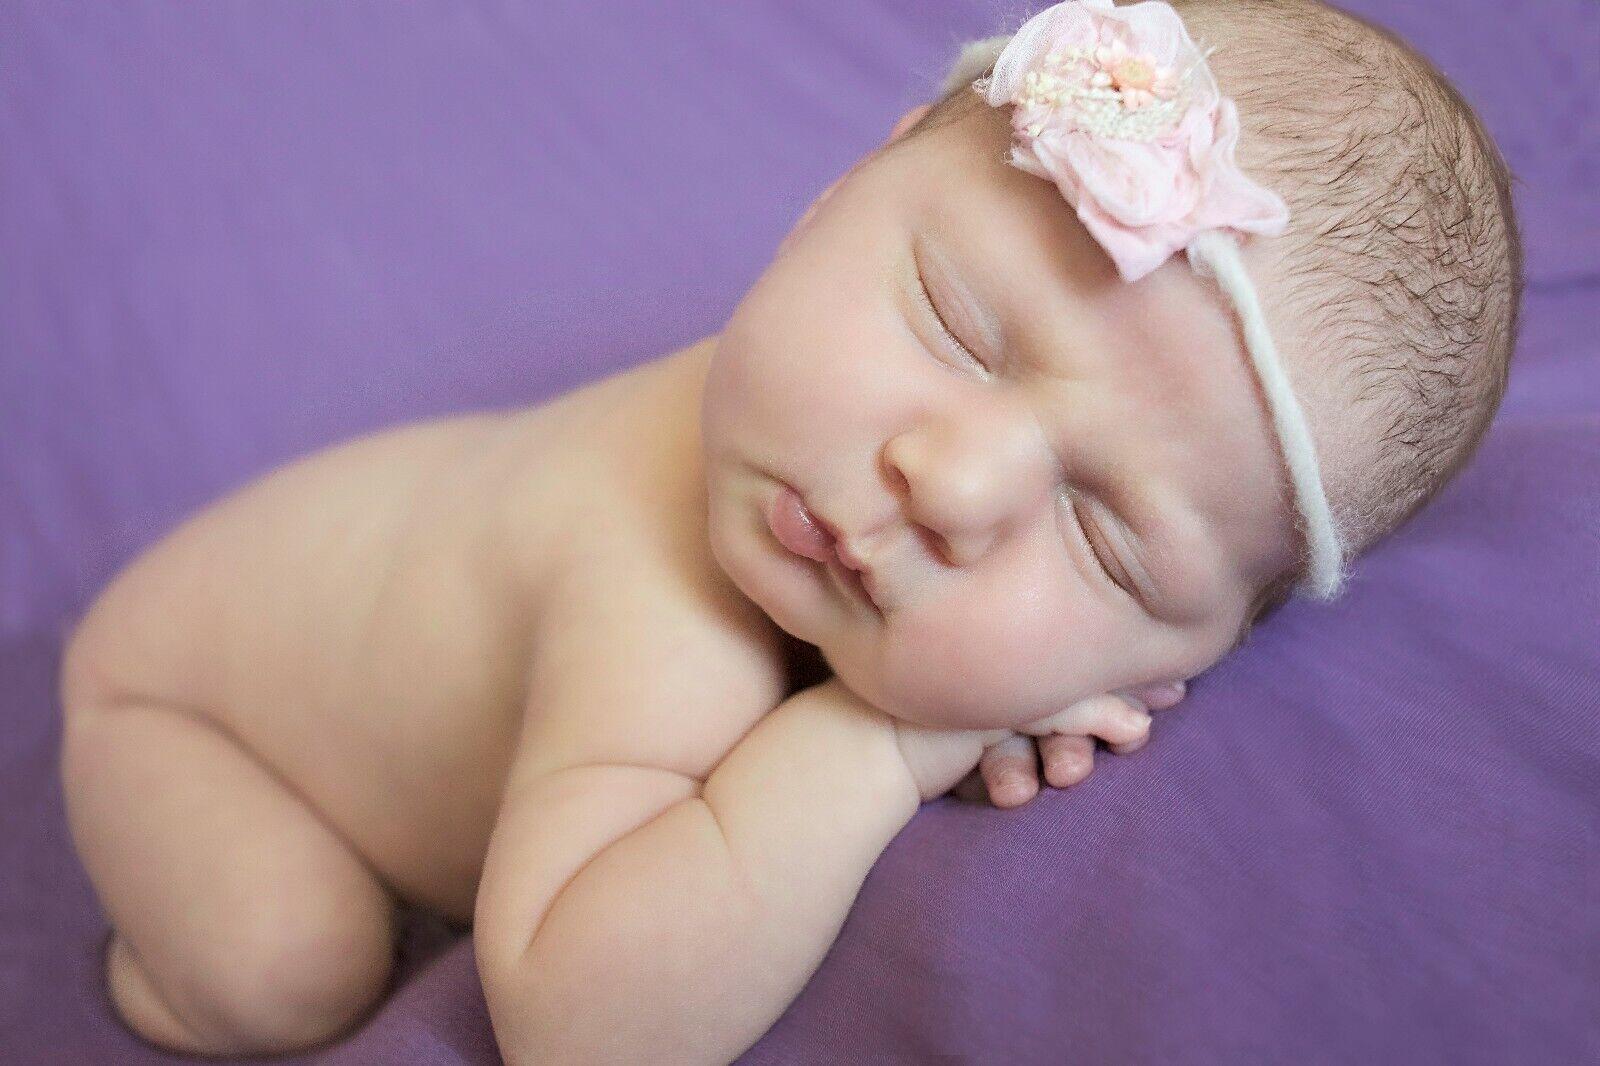 Newborn Photo Prop: Plum Bean Bag Blanket for Newborn Photo